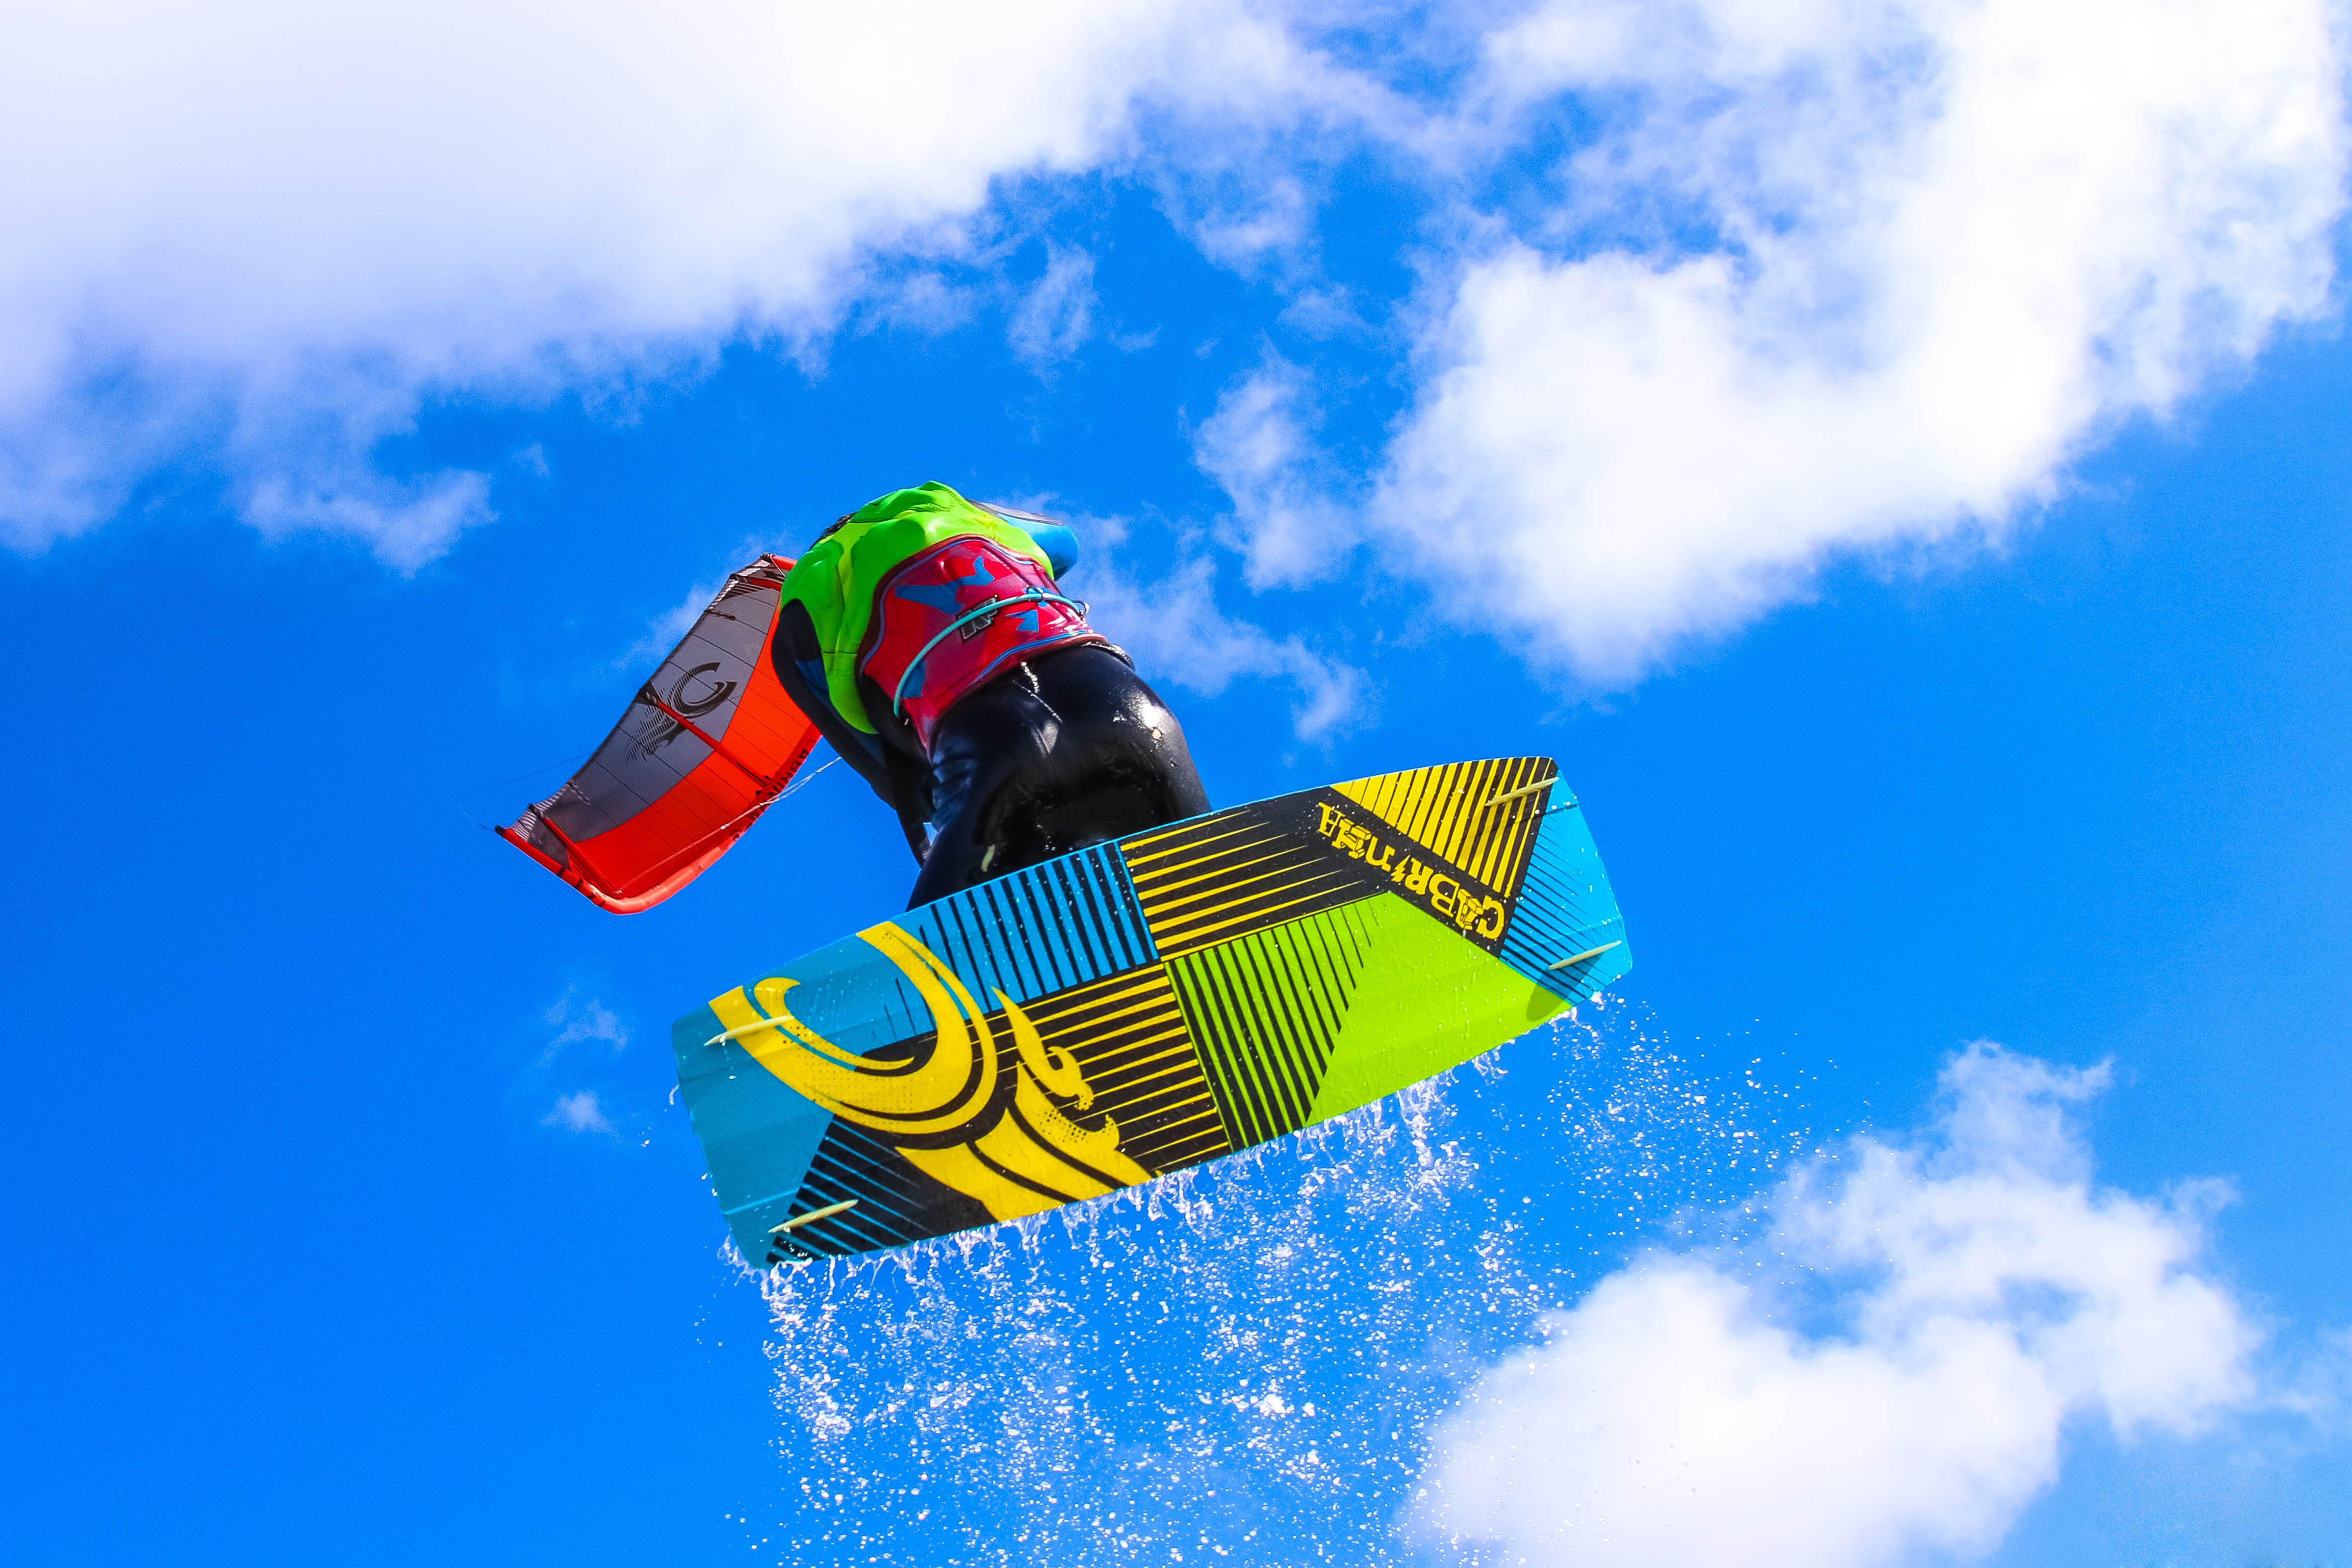 Person Doing Kite Boarding